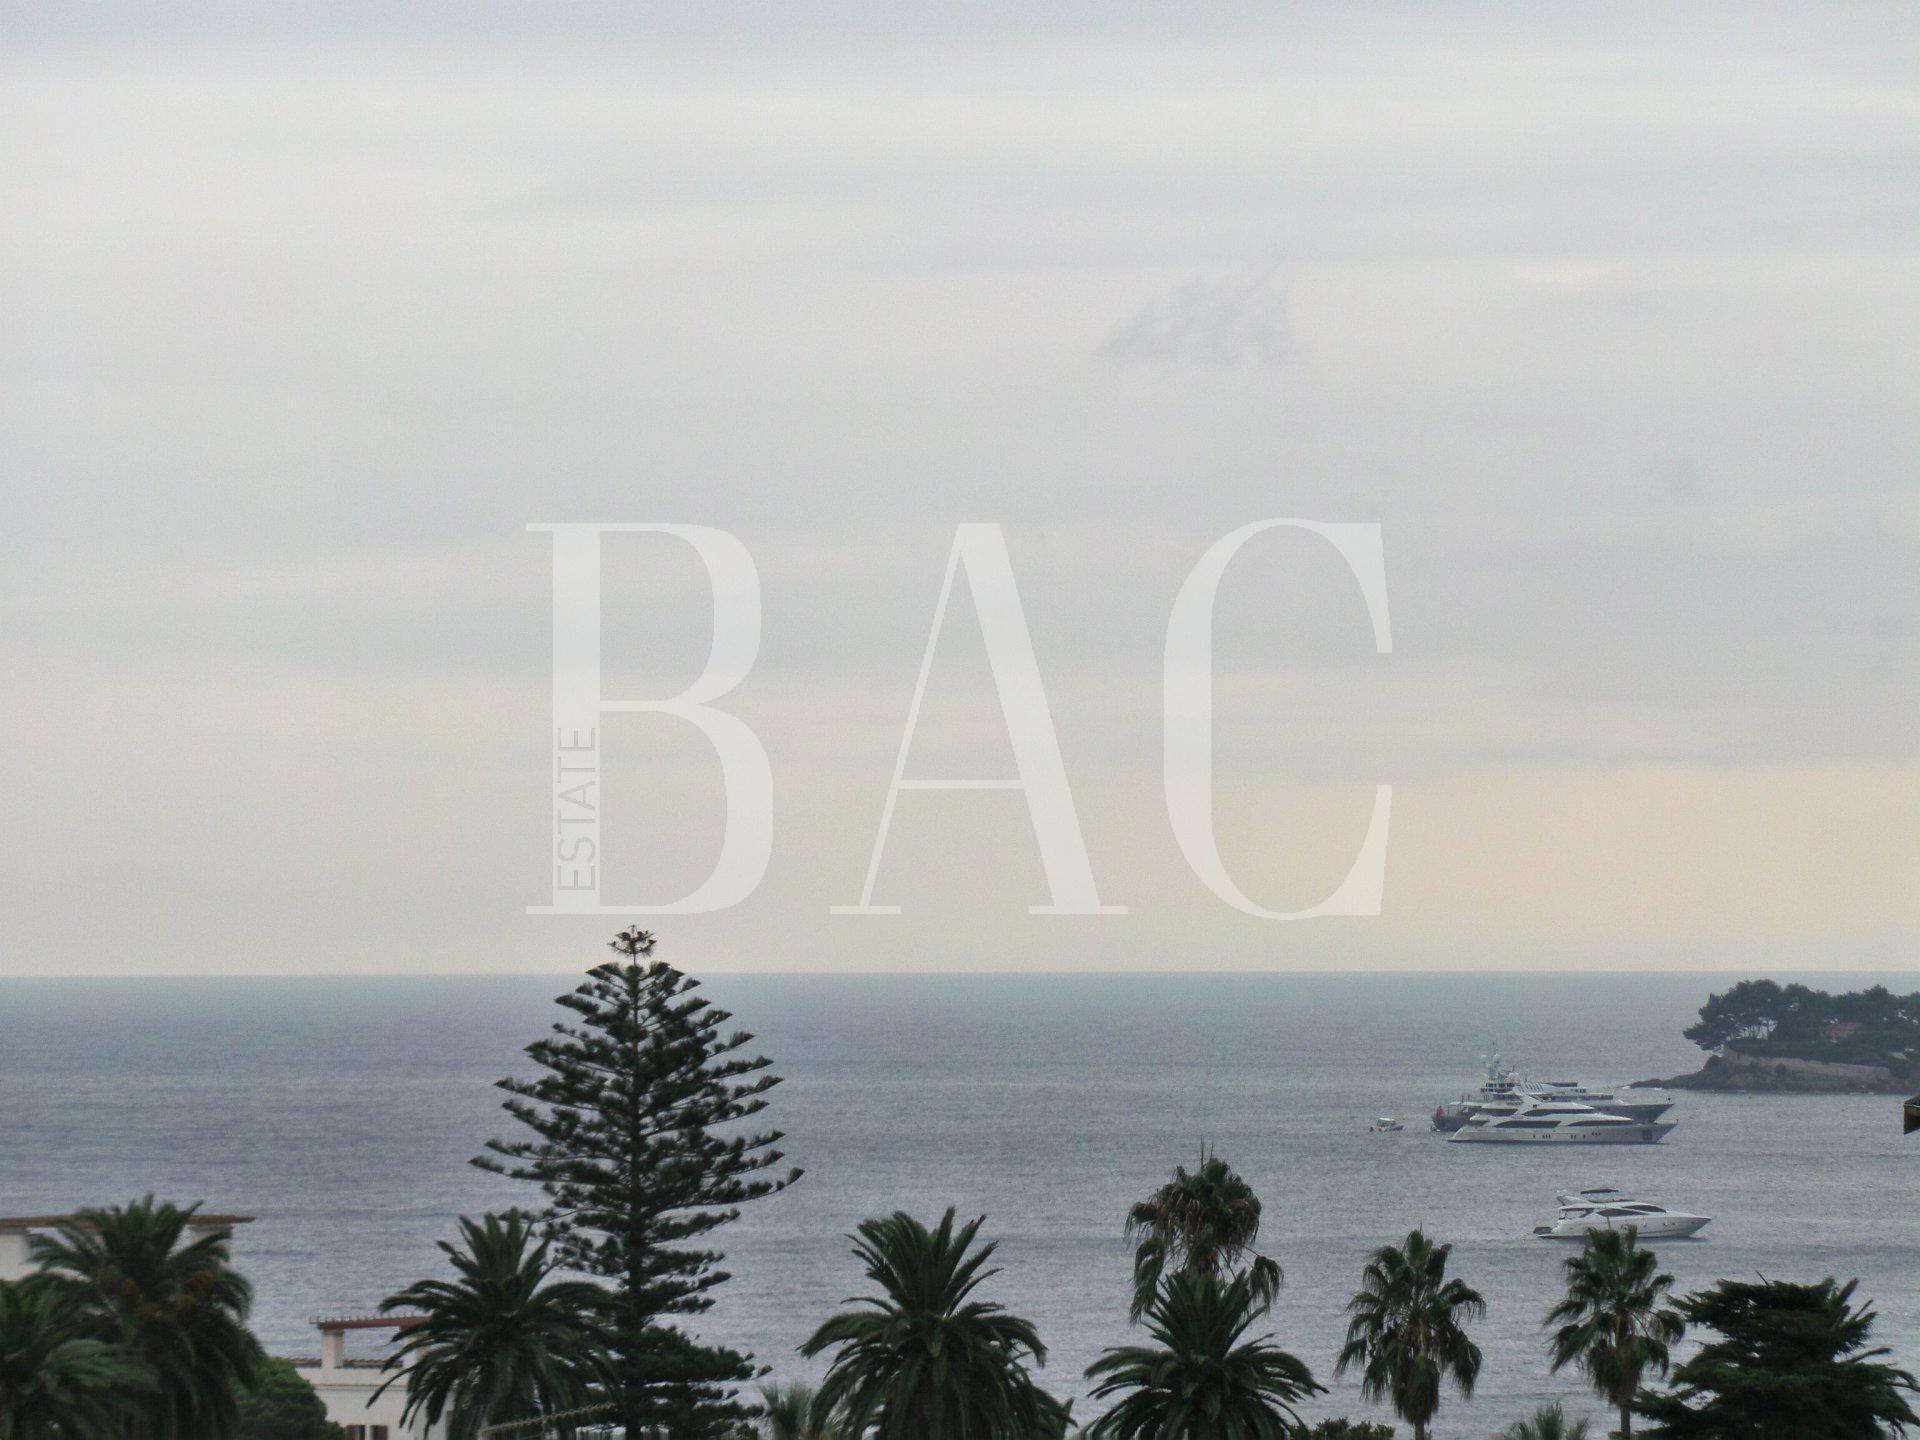 Beaulieu Sur Mer en centre ville et avec vue mer